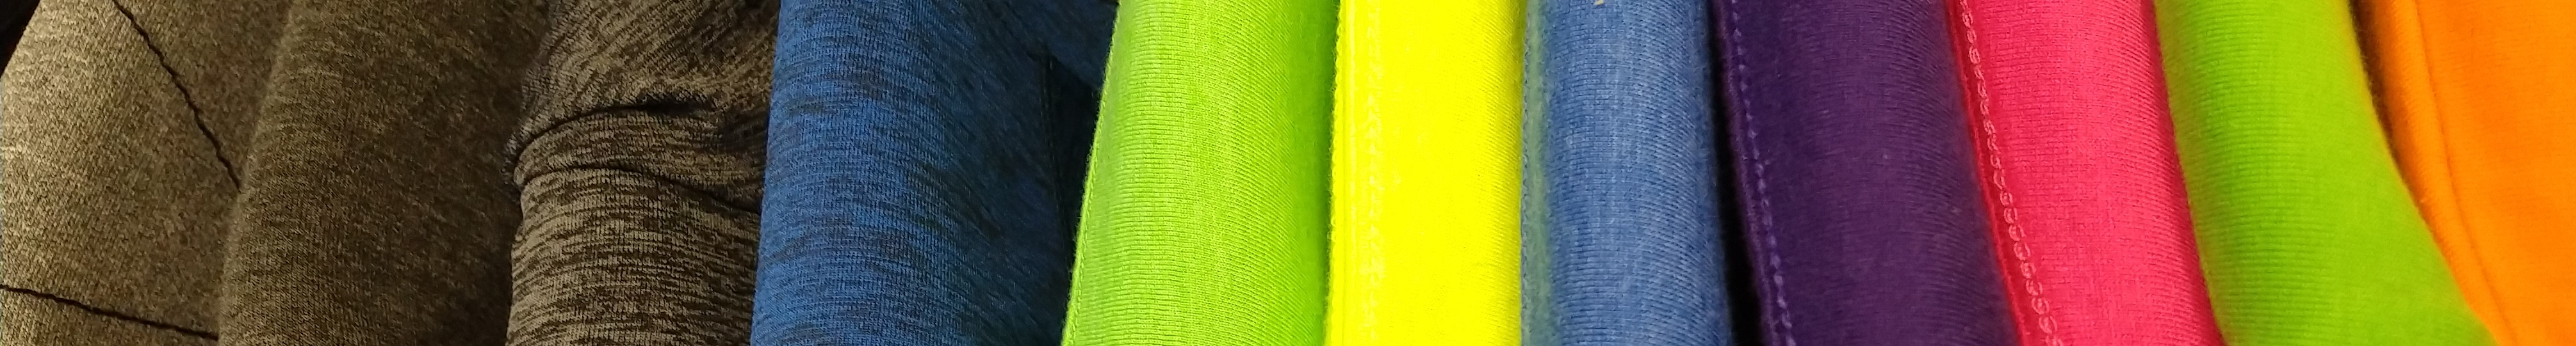 Textielbanner_3.jpg